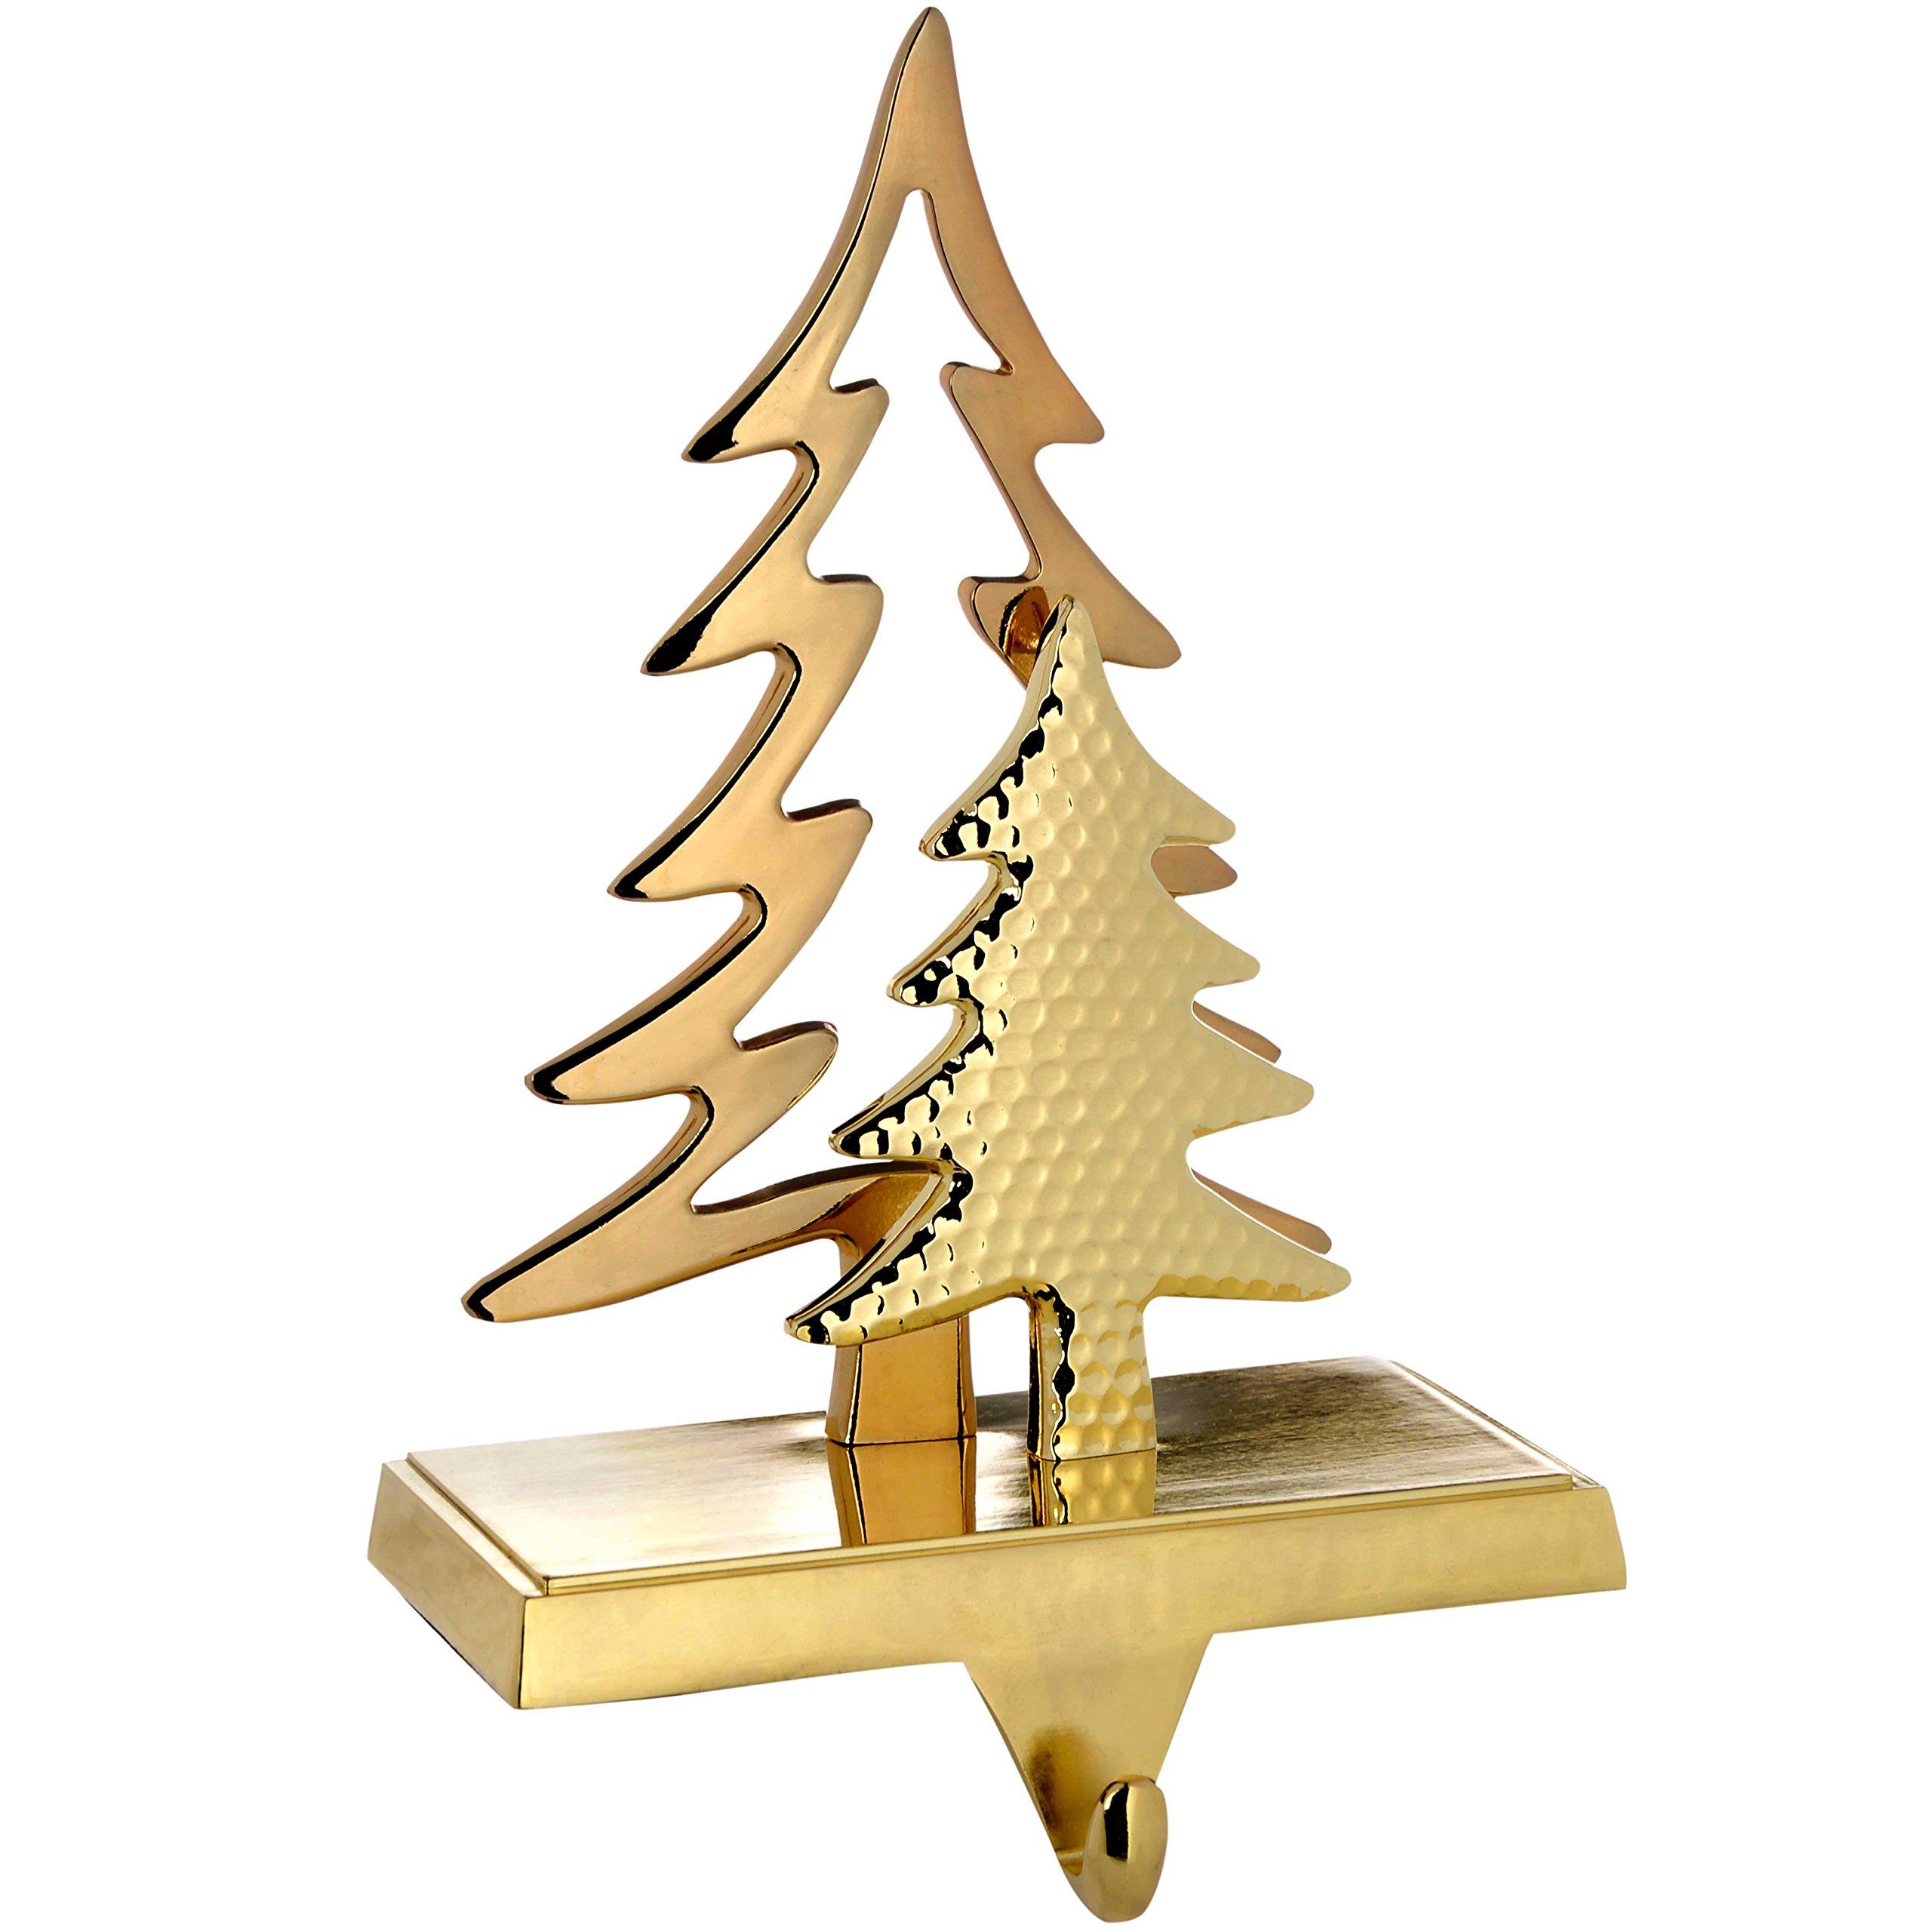 WeRChristmas Gold Plated Christmas Tree Stocking Holder Decoration, 18 Cm, Metal